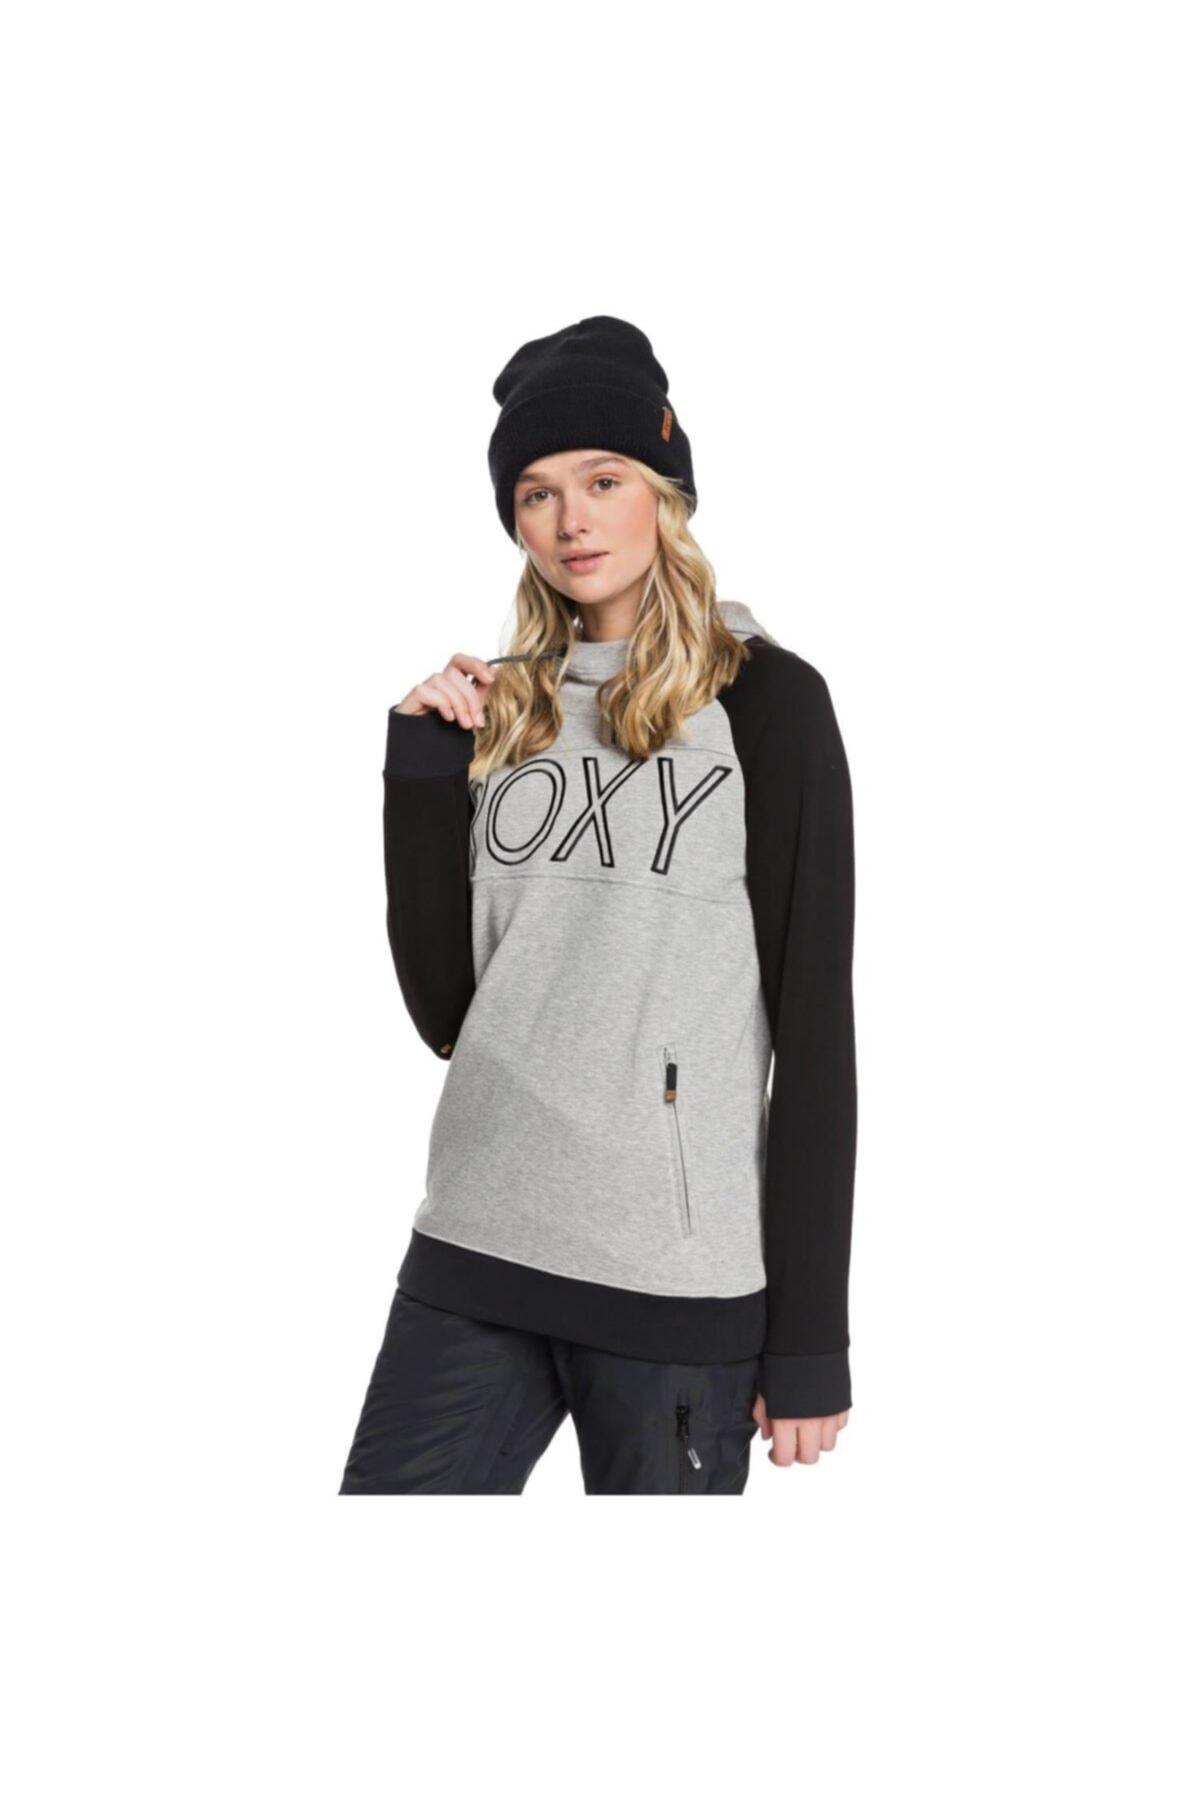 Roxy Liberty Kadın Sweatshirt 1